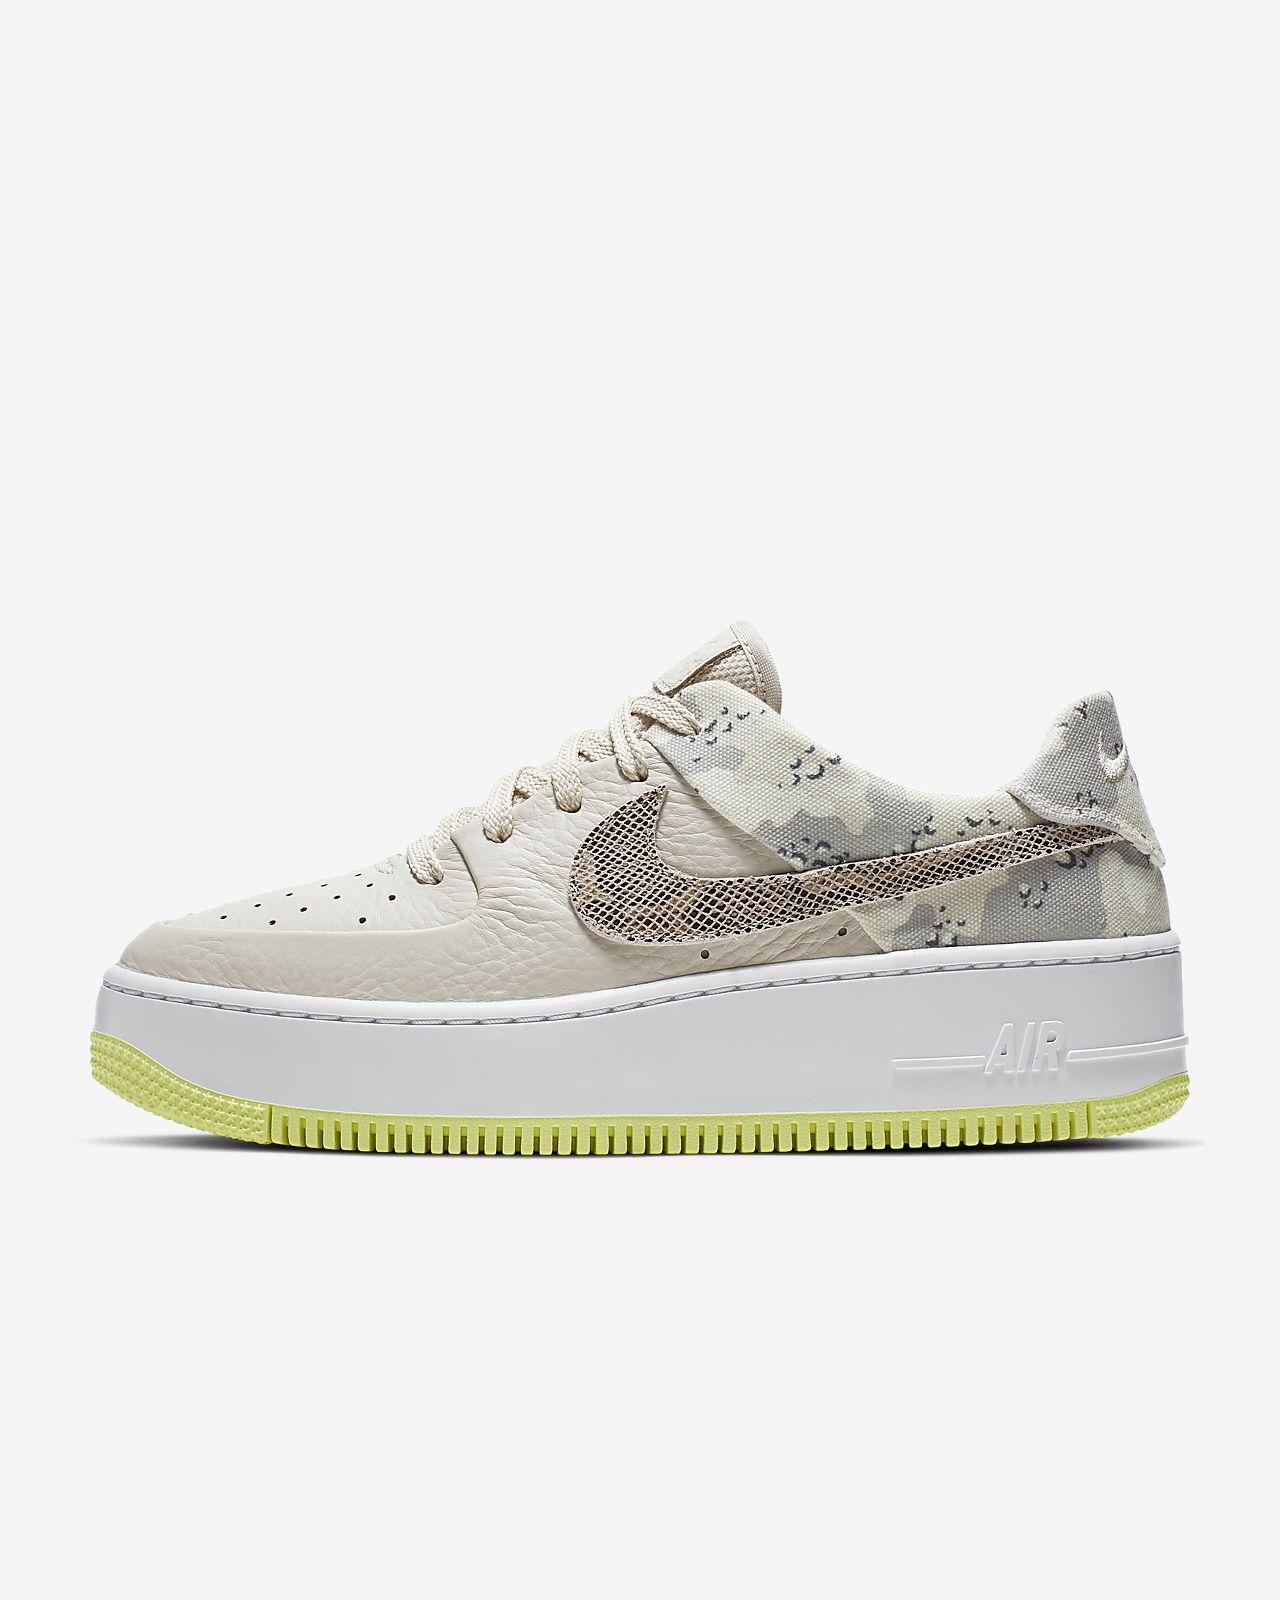 Nike Air Force 1 Sage Low Premium Camo női cipő